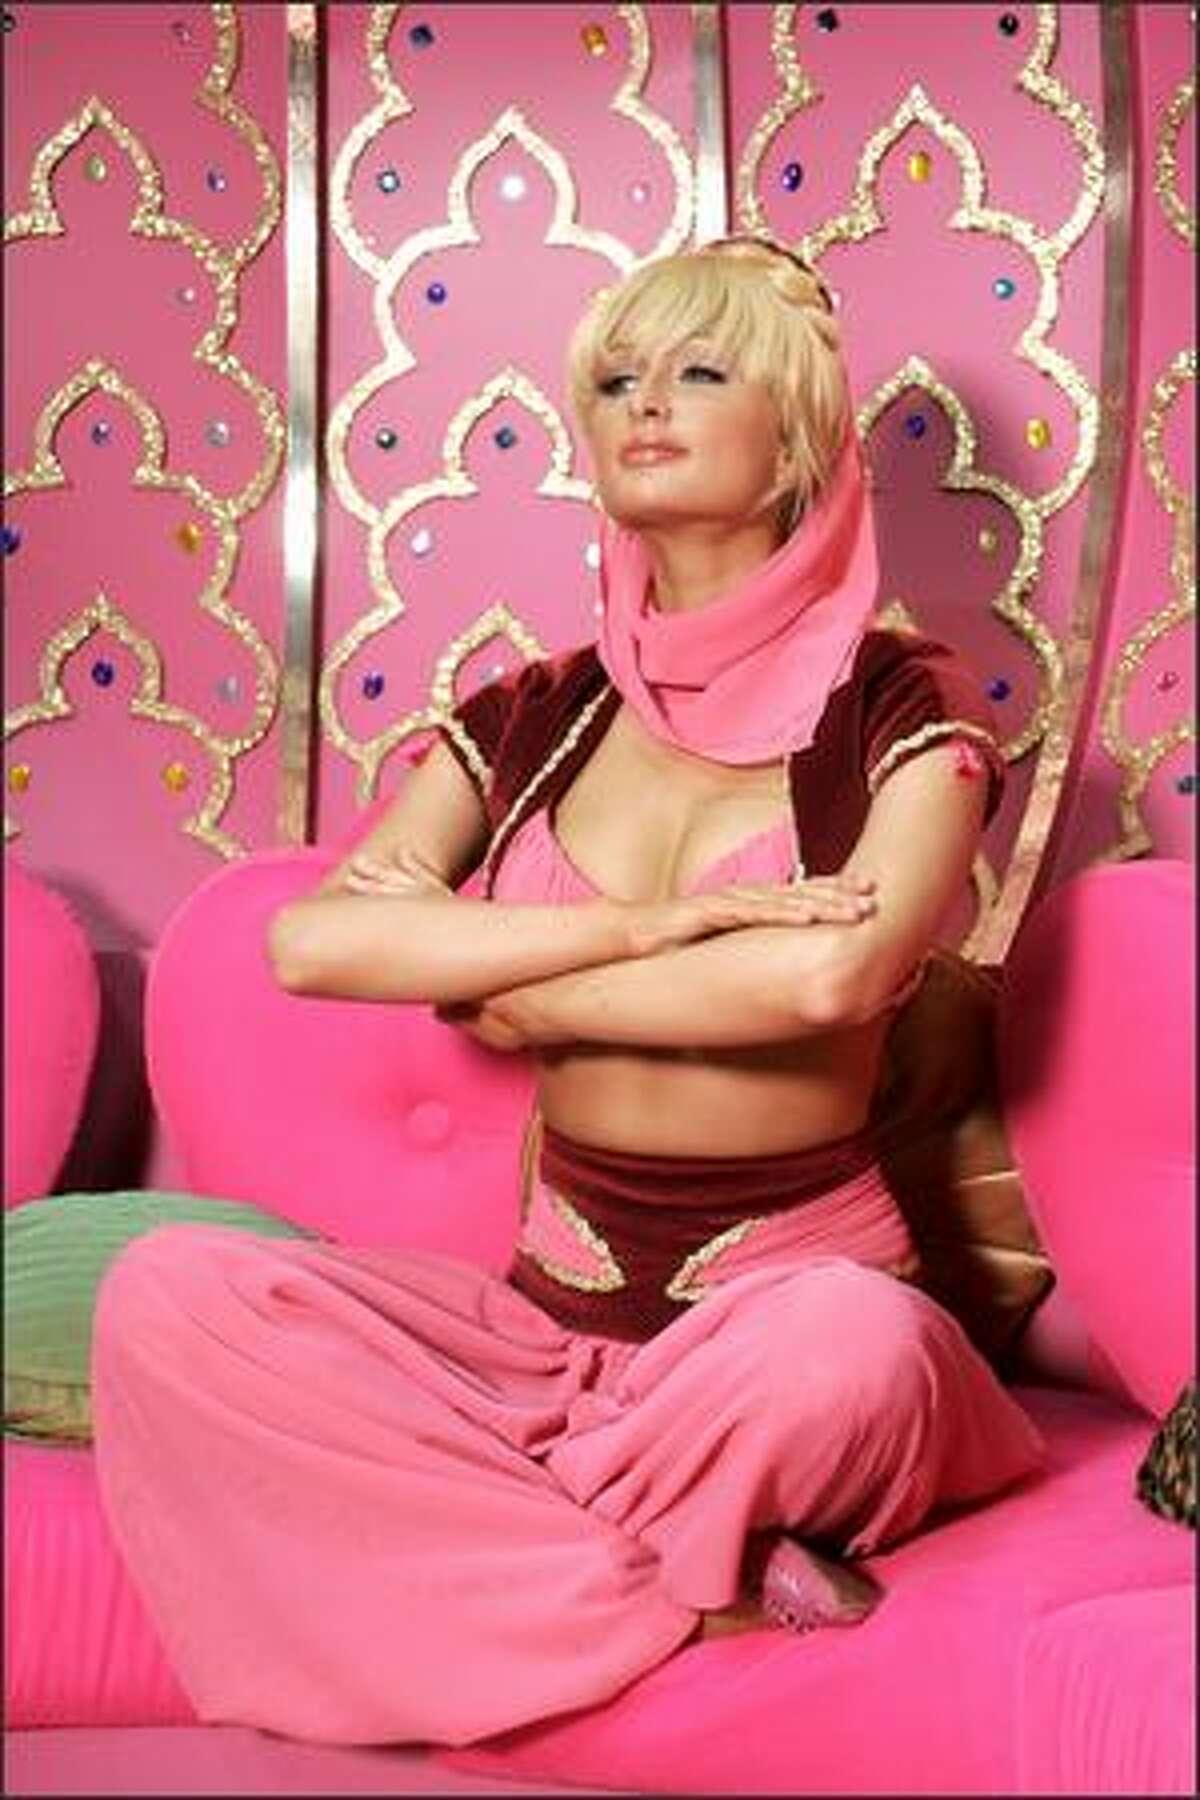 Paris Hilton channels Jeannie the genie when she plays